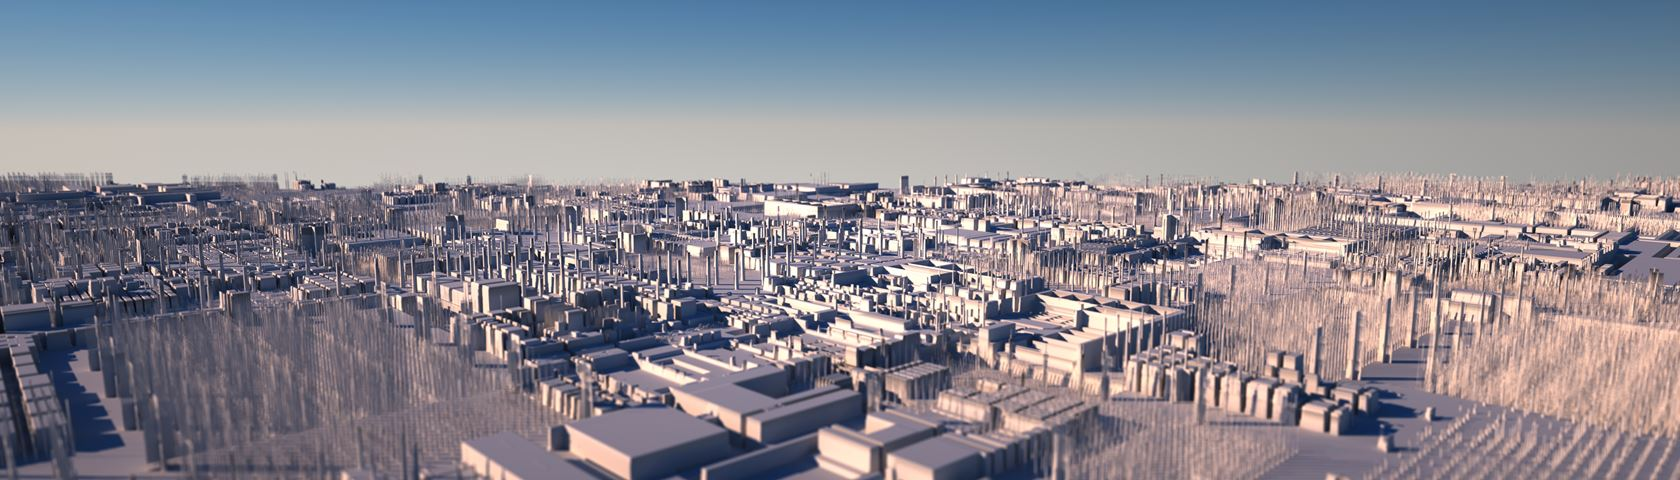 The Infinite City (Daylight)